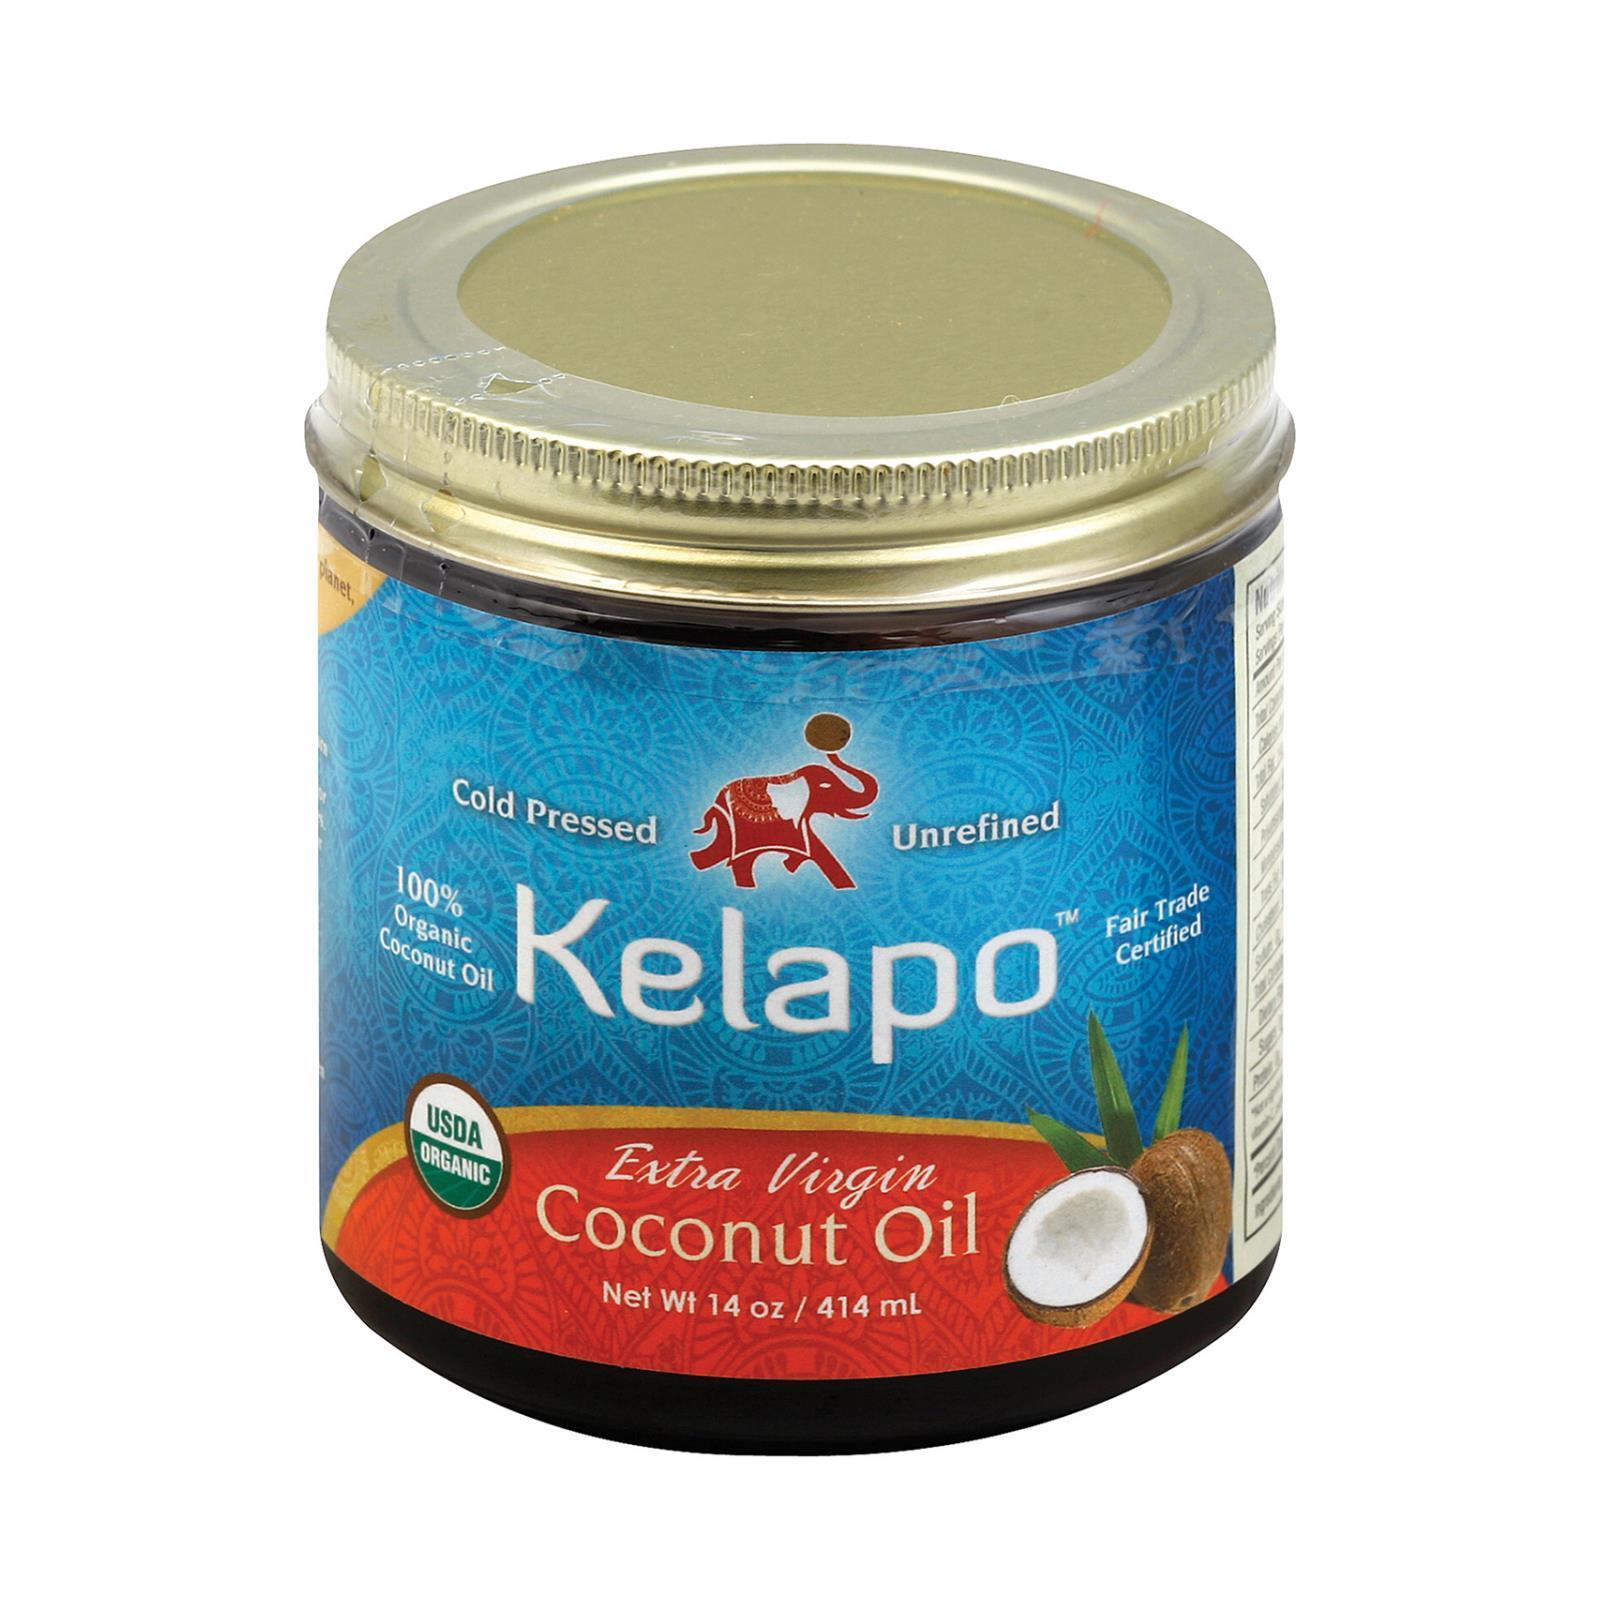 Kelapo Organic Extra Virgin Coconut Oil Amber Glass Jar - Case of 6 - 14 oz.